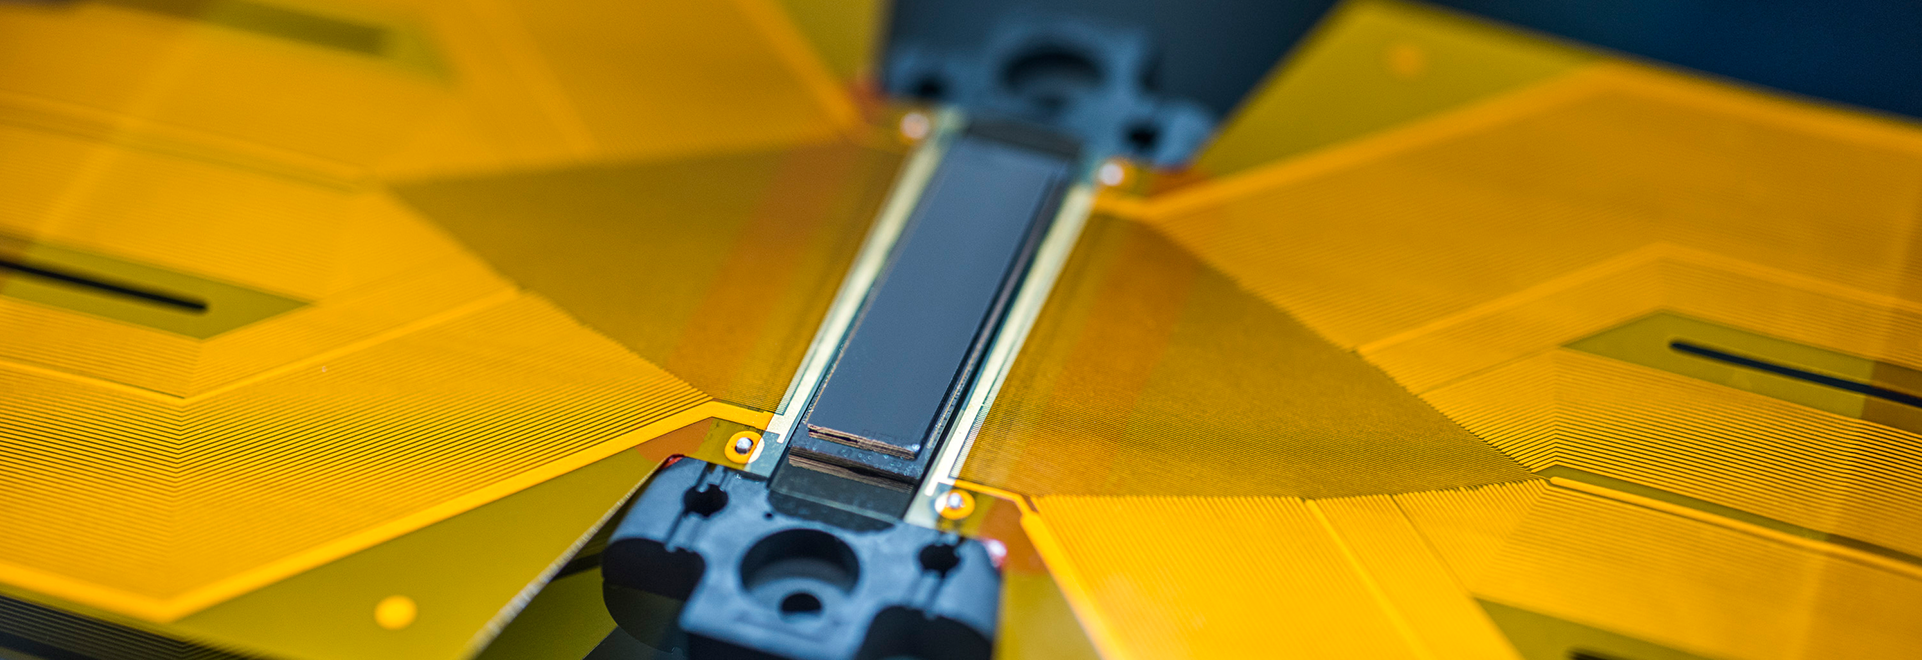 MEMS inkjet printheads | Philips Engineering Solutions